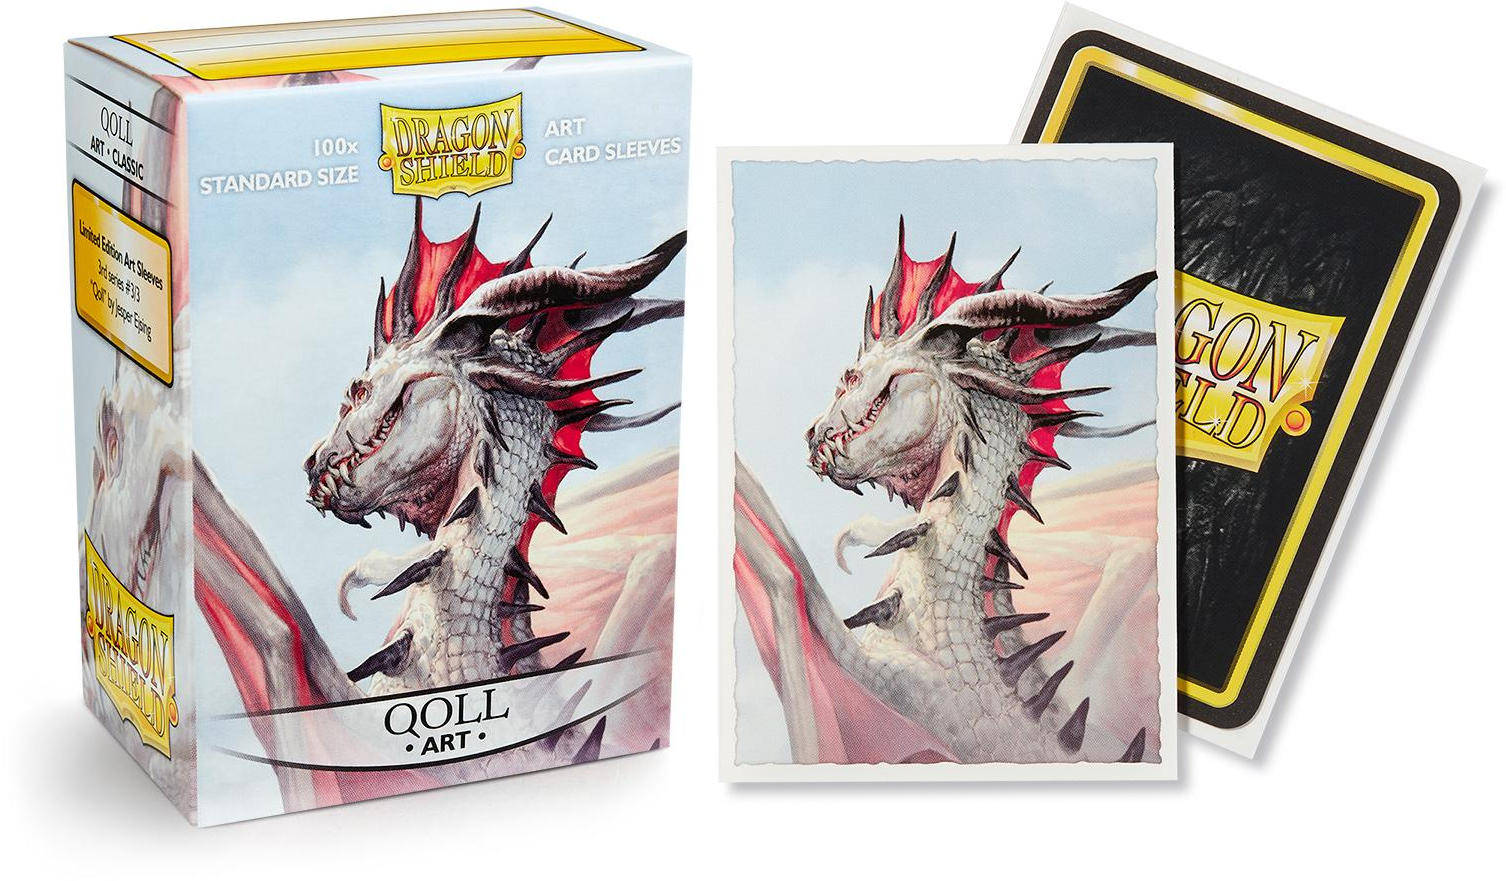 Dragon Shield Classic Art Standard-Size Sleeves - Qoll - 100ct